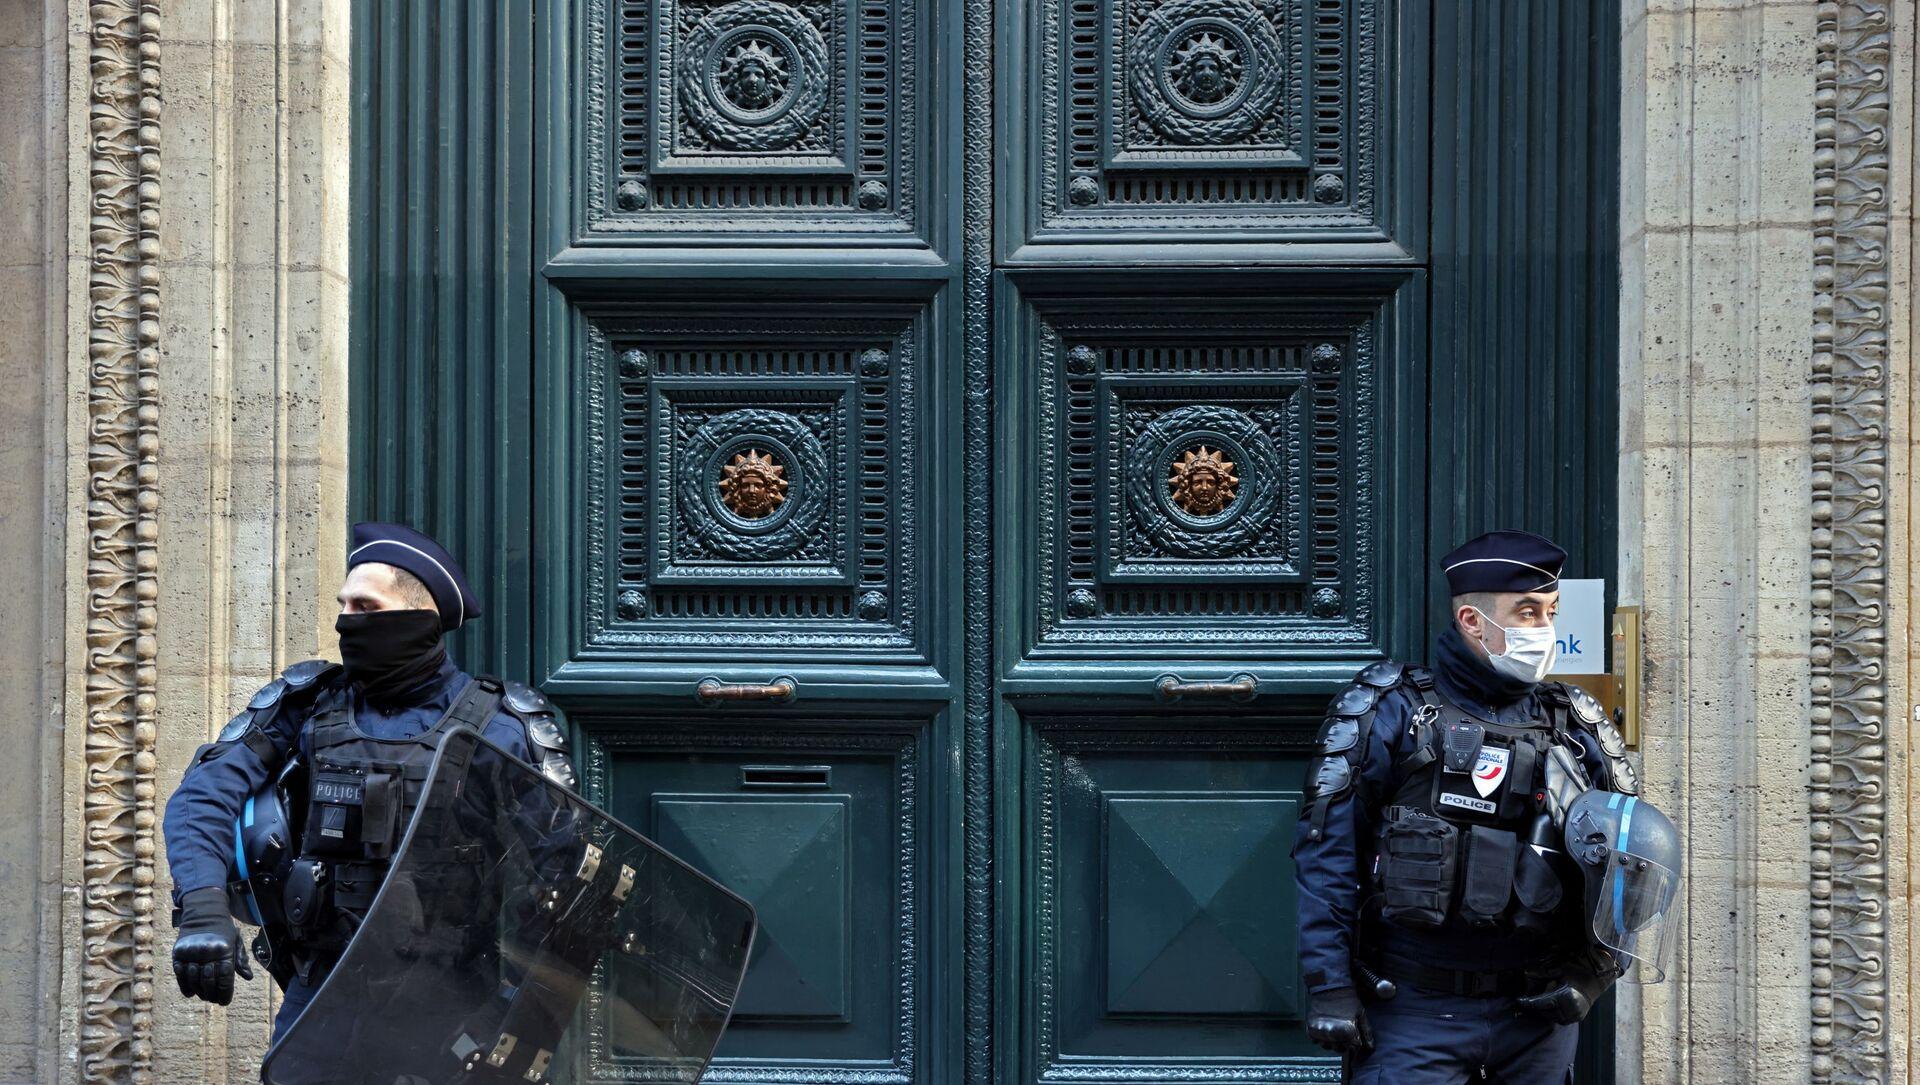 Fransa polis - Palais Vivienne - Sputnik Türkiye, 1920, 09.04.2021